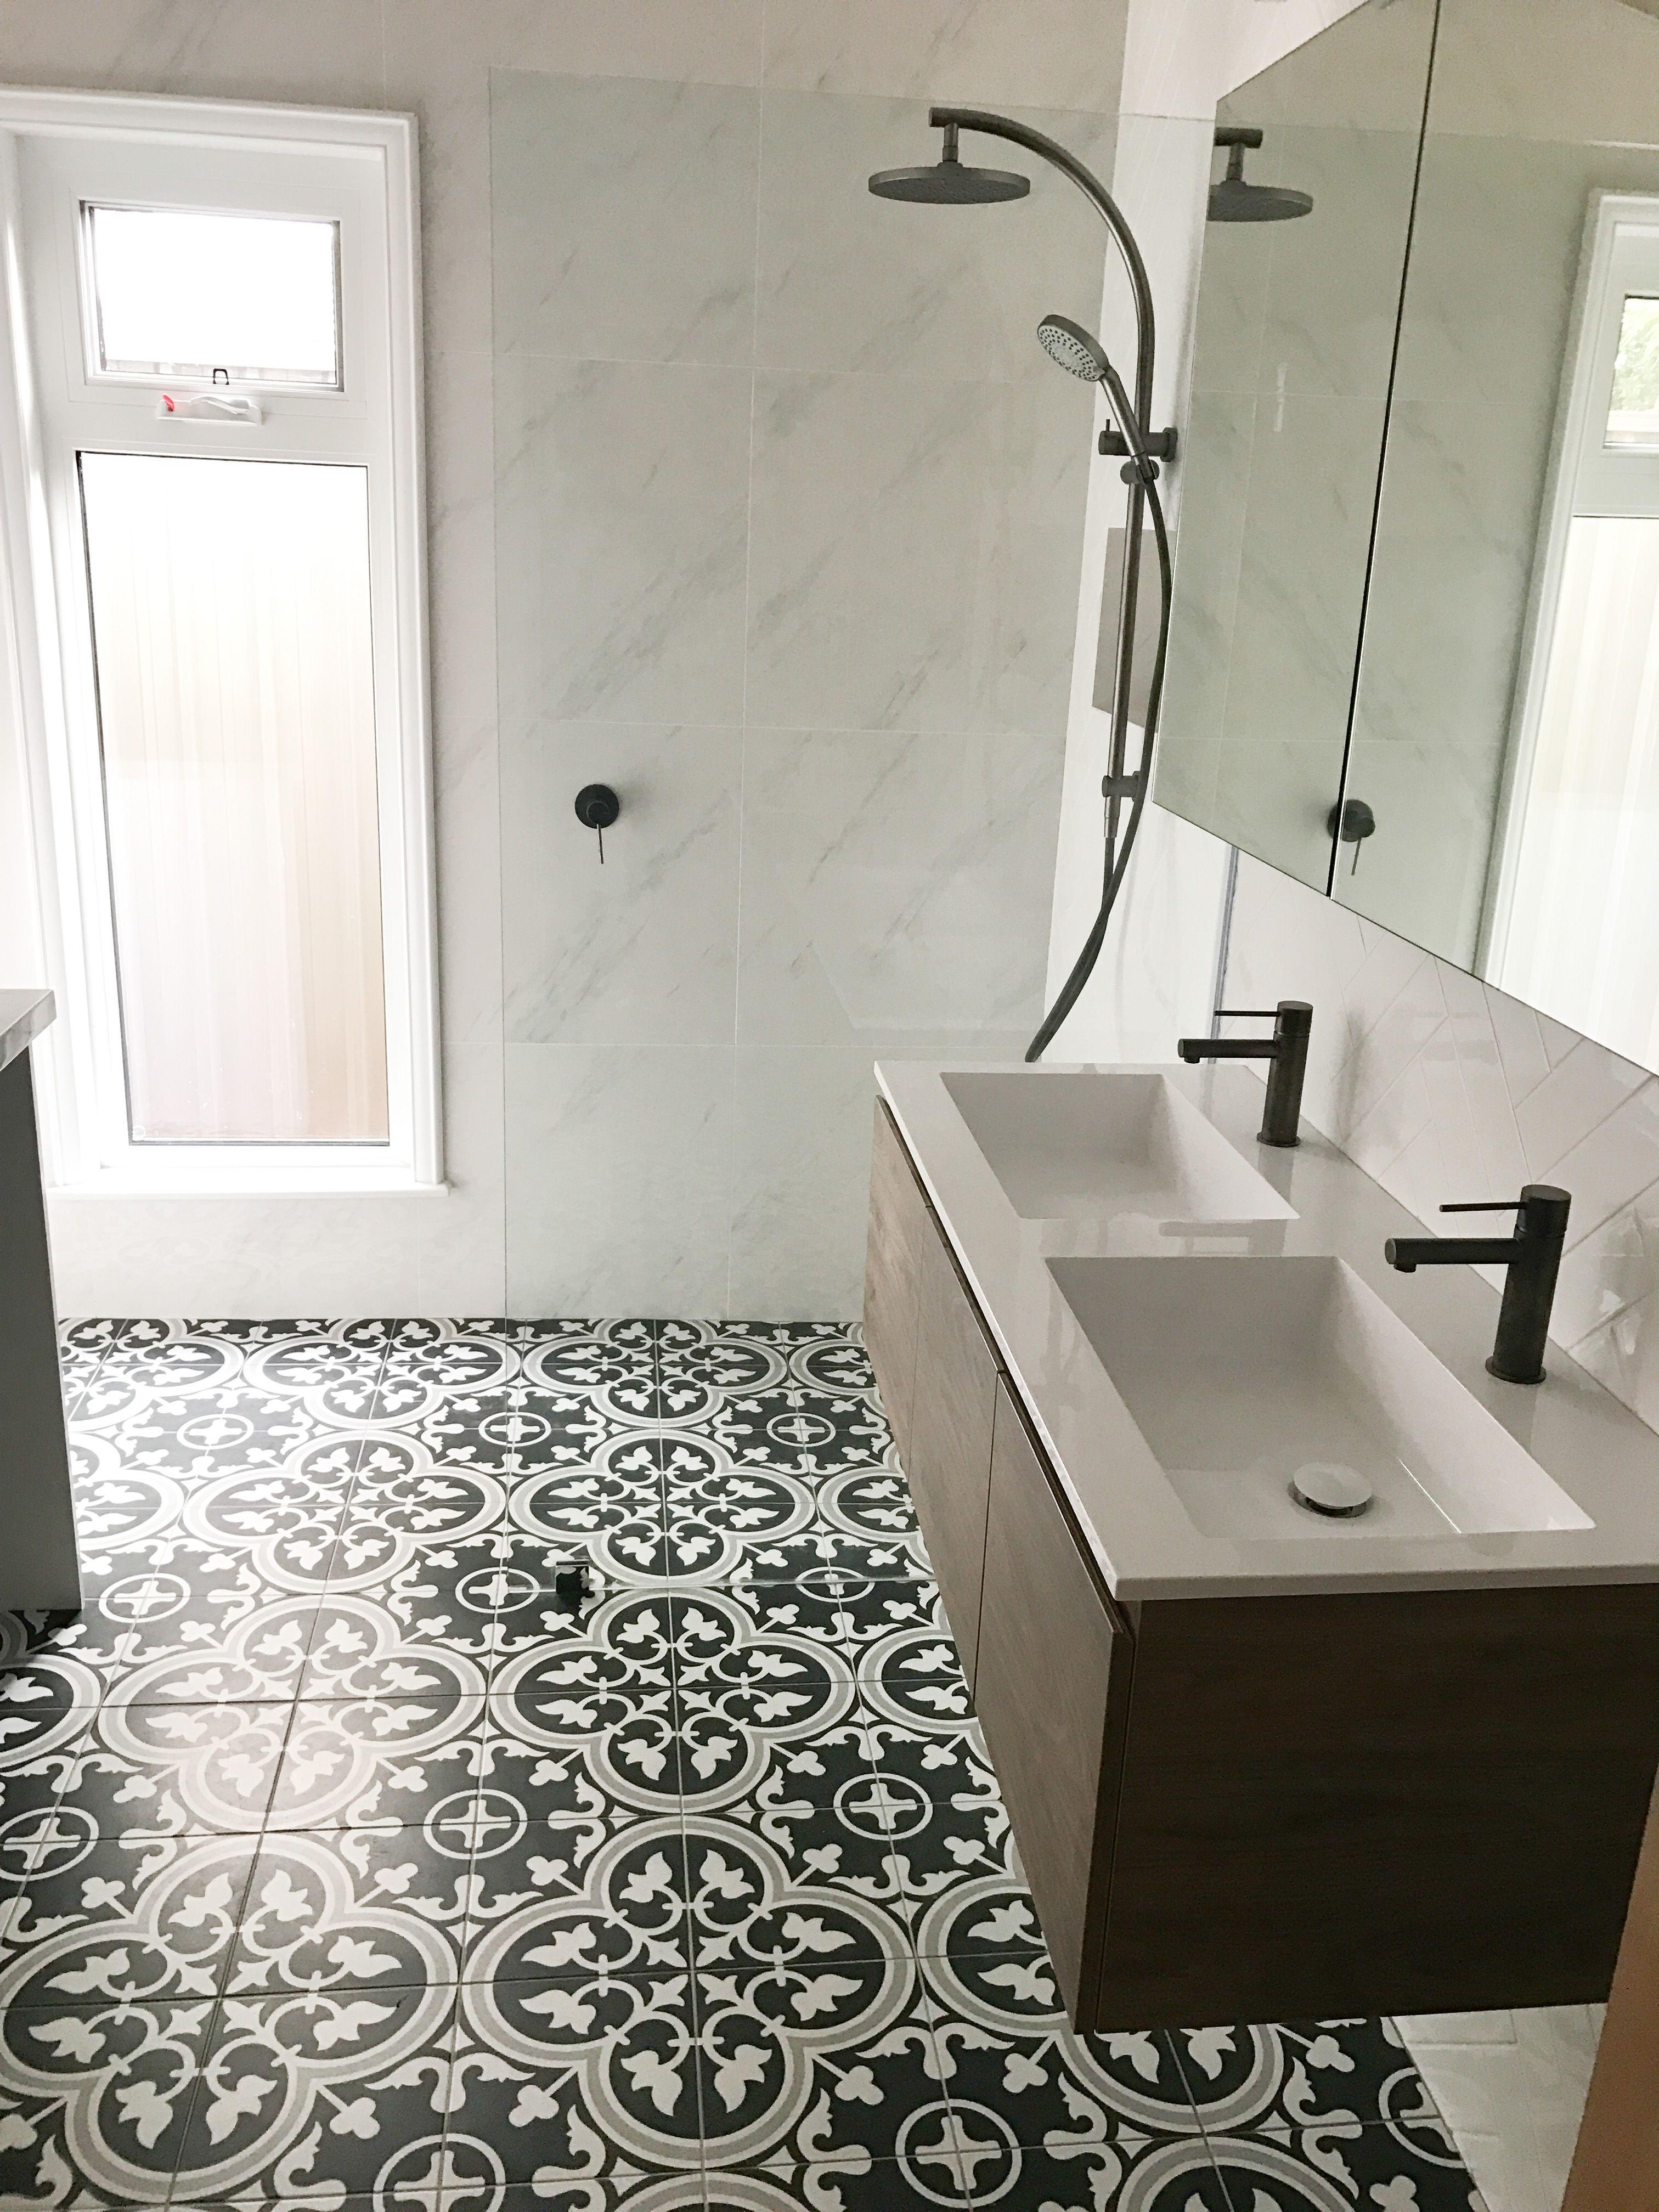 Encaustic Floor Double Vanity Laundrybathroom Combination